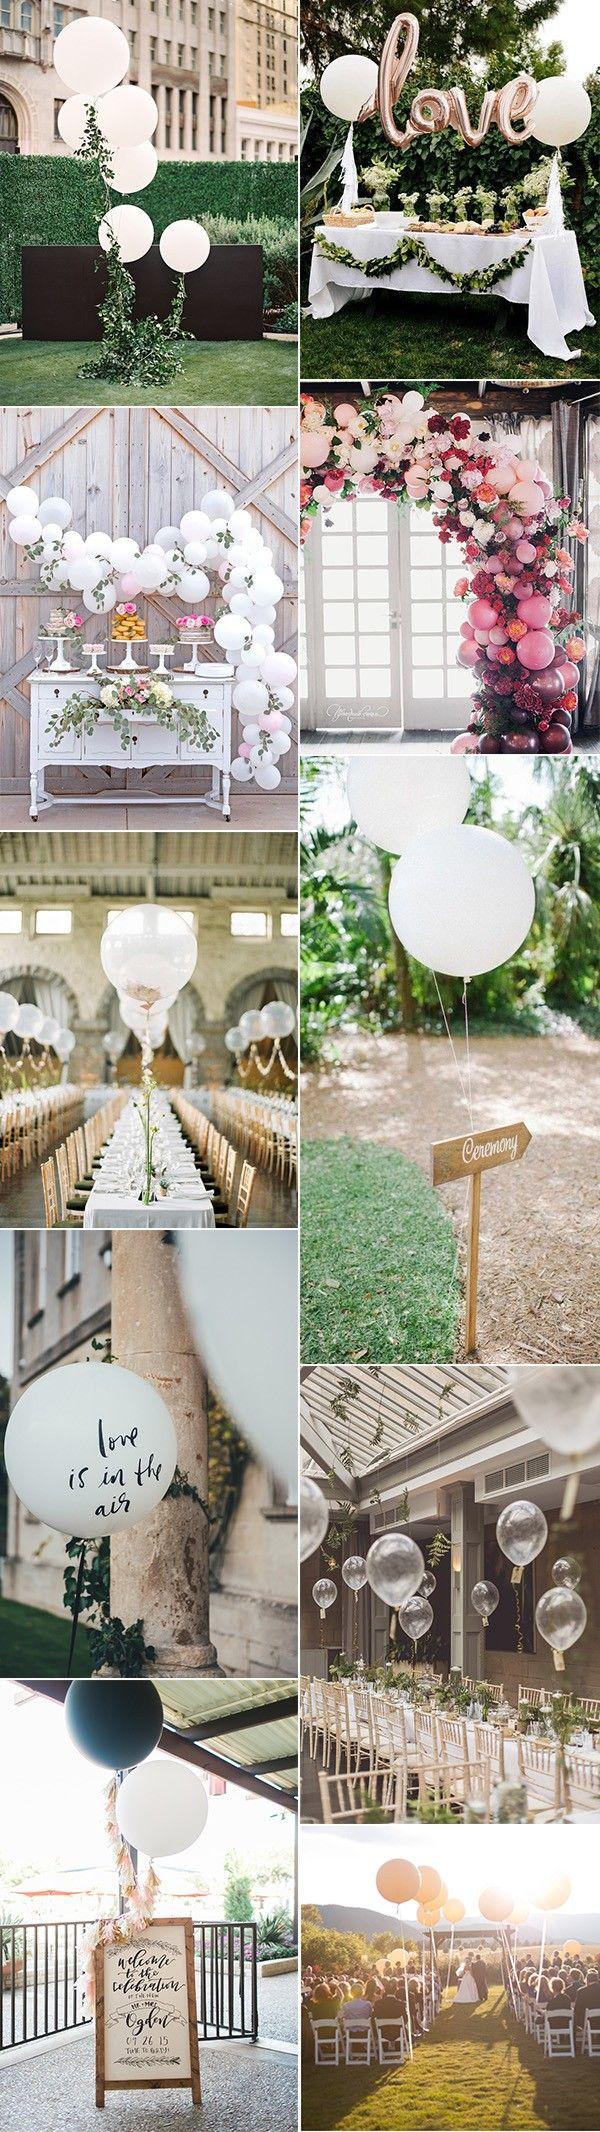 romantic balloon wedding decoration ideas